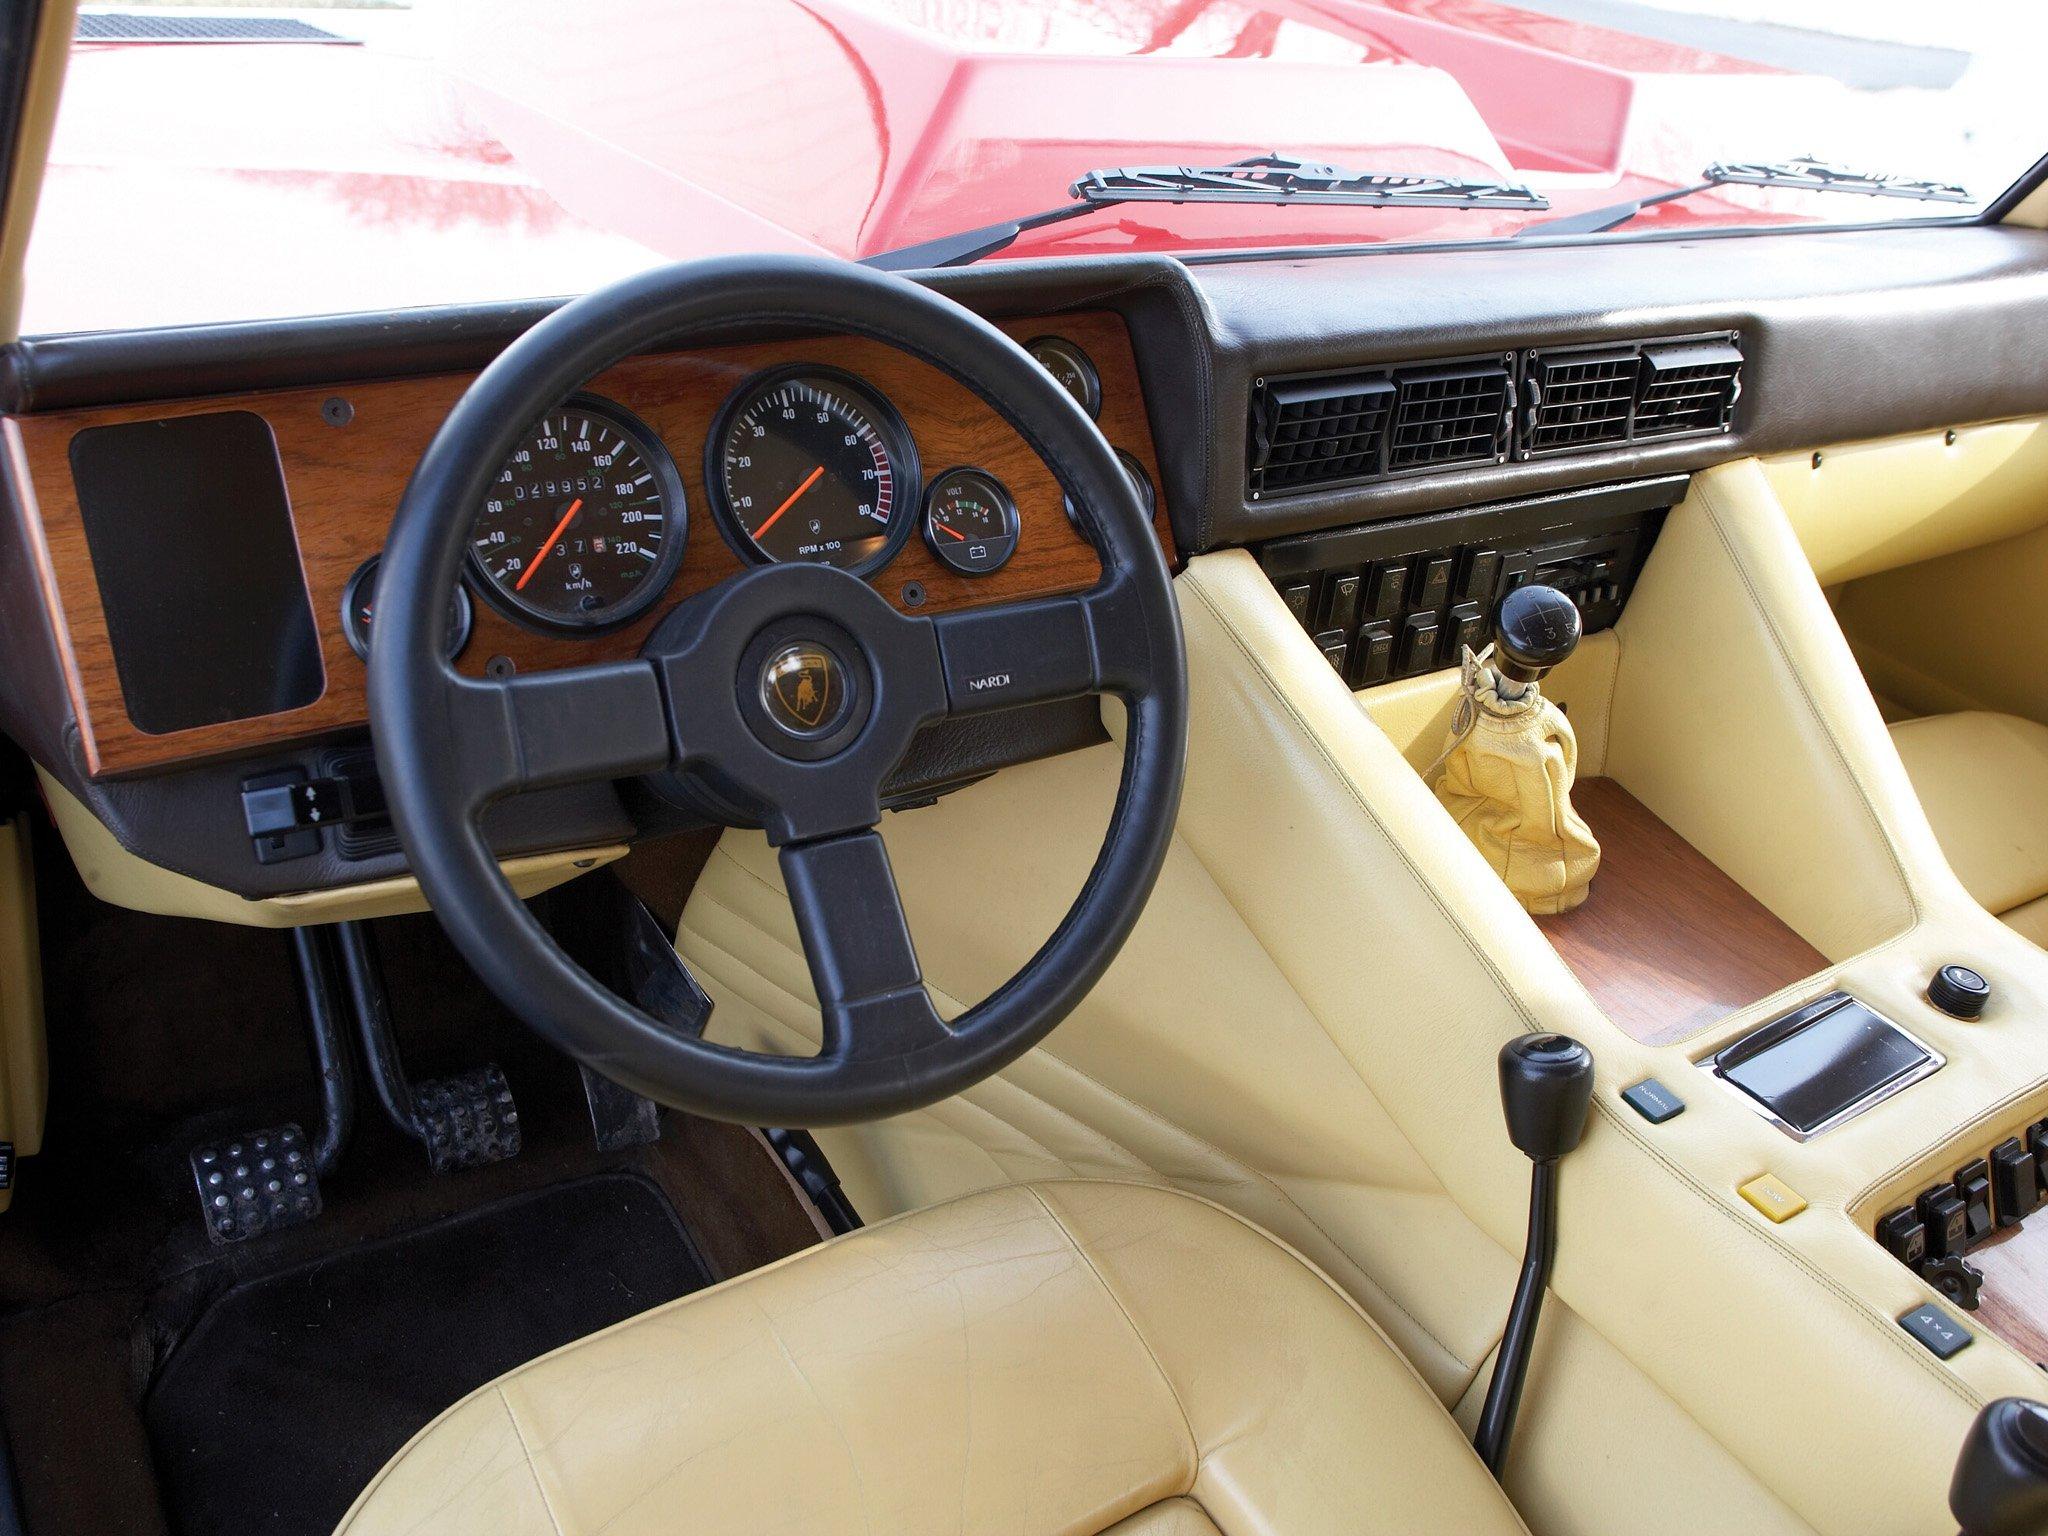 Lamborghini Lm002 Interior 1986 90 Lamborghini Lm002 Suv